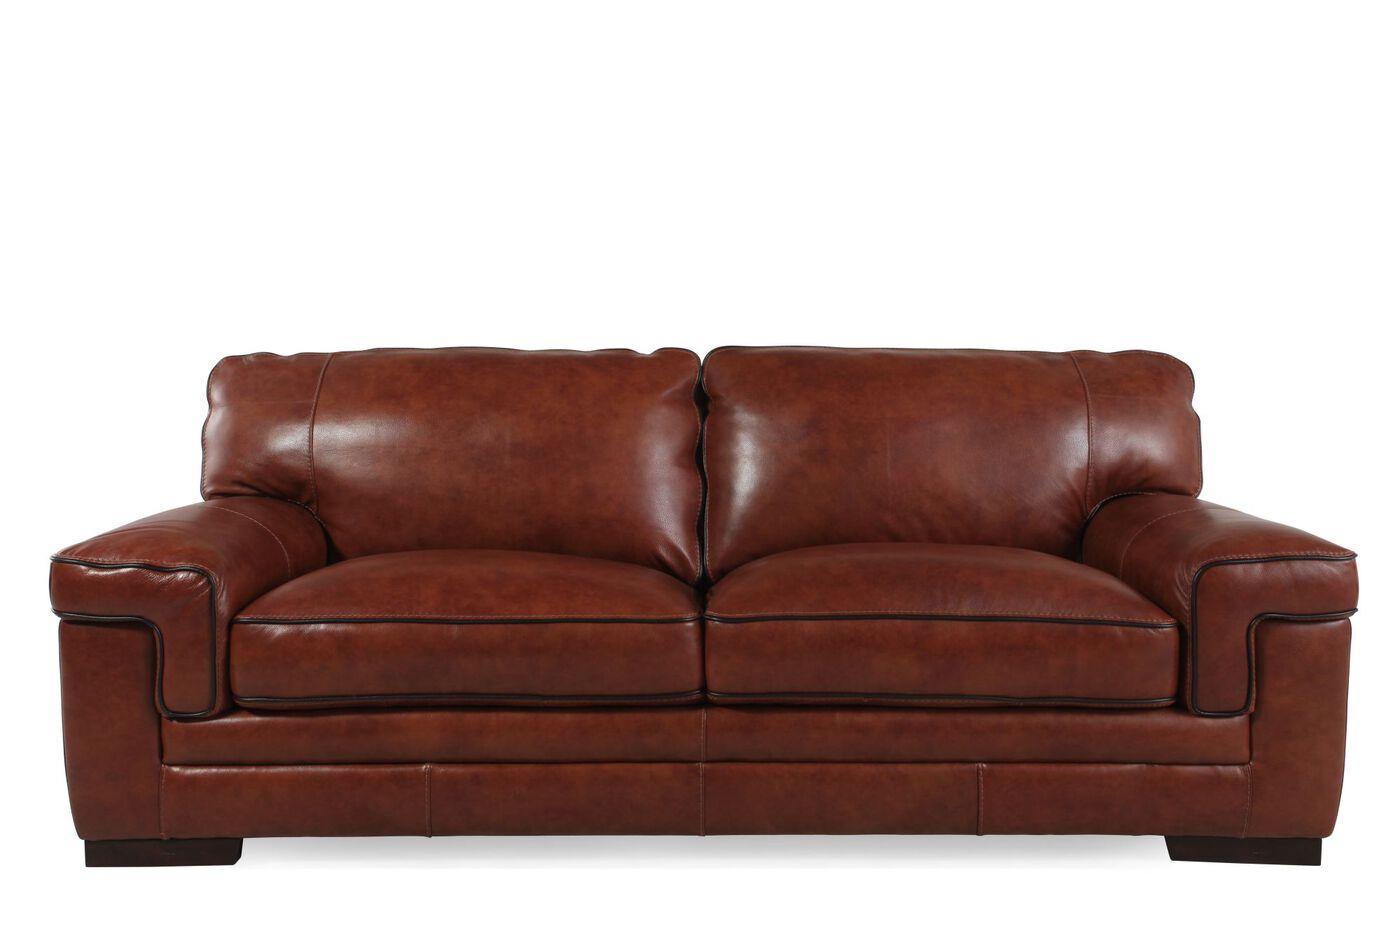 Simon Li Leather Stampede Chestnut Sofa Mathis Brothers